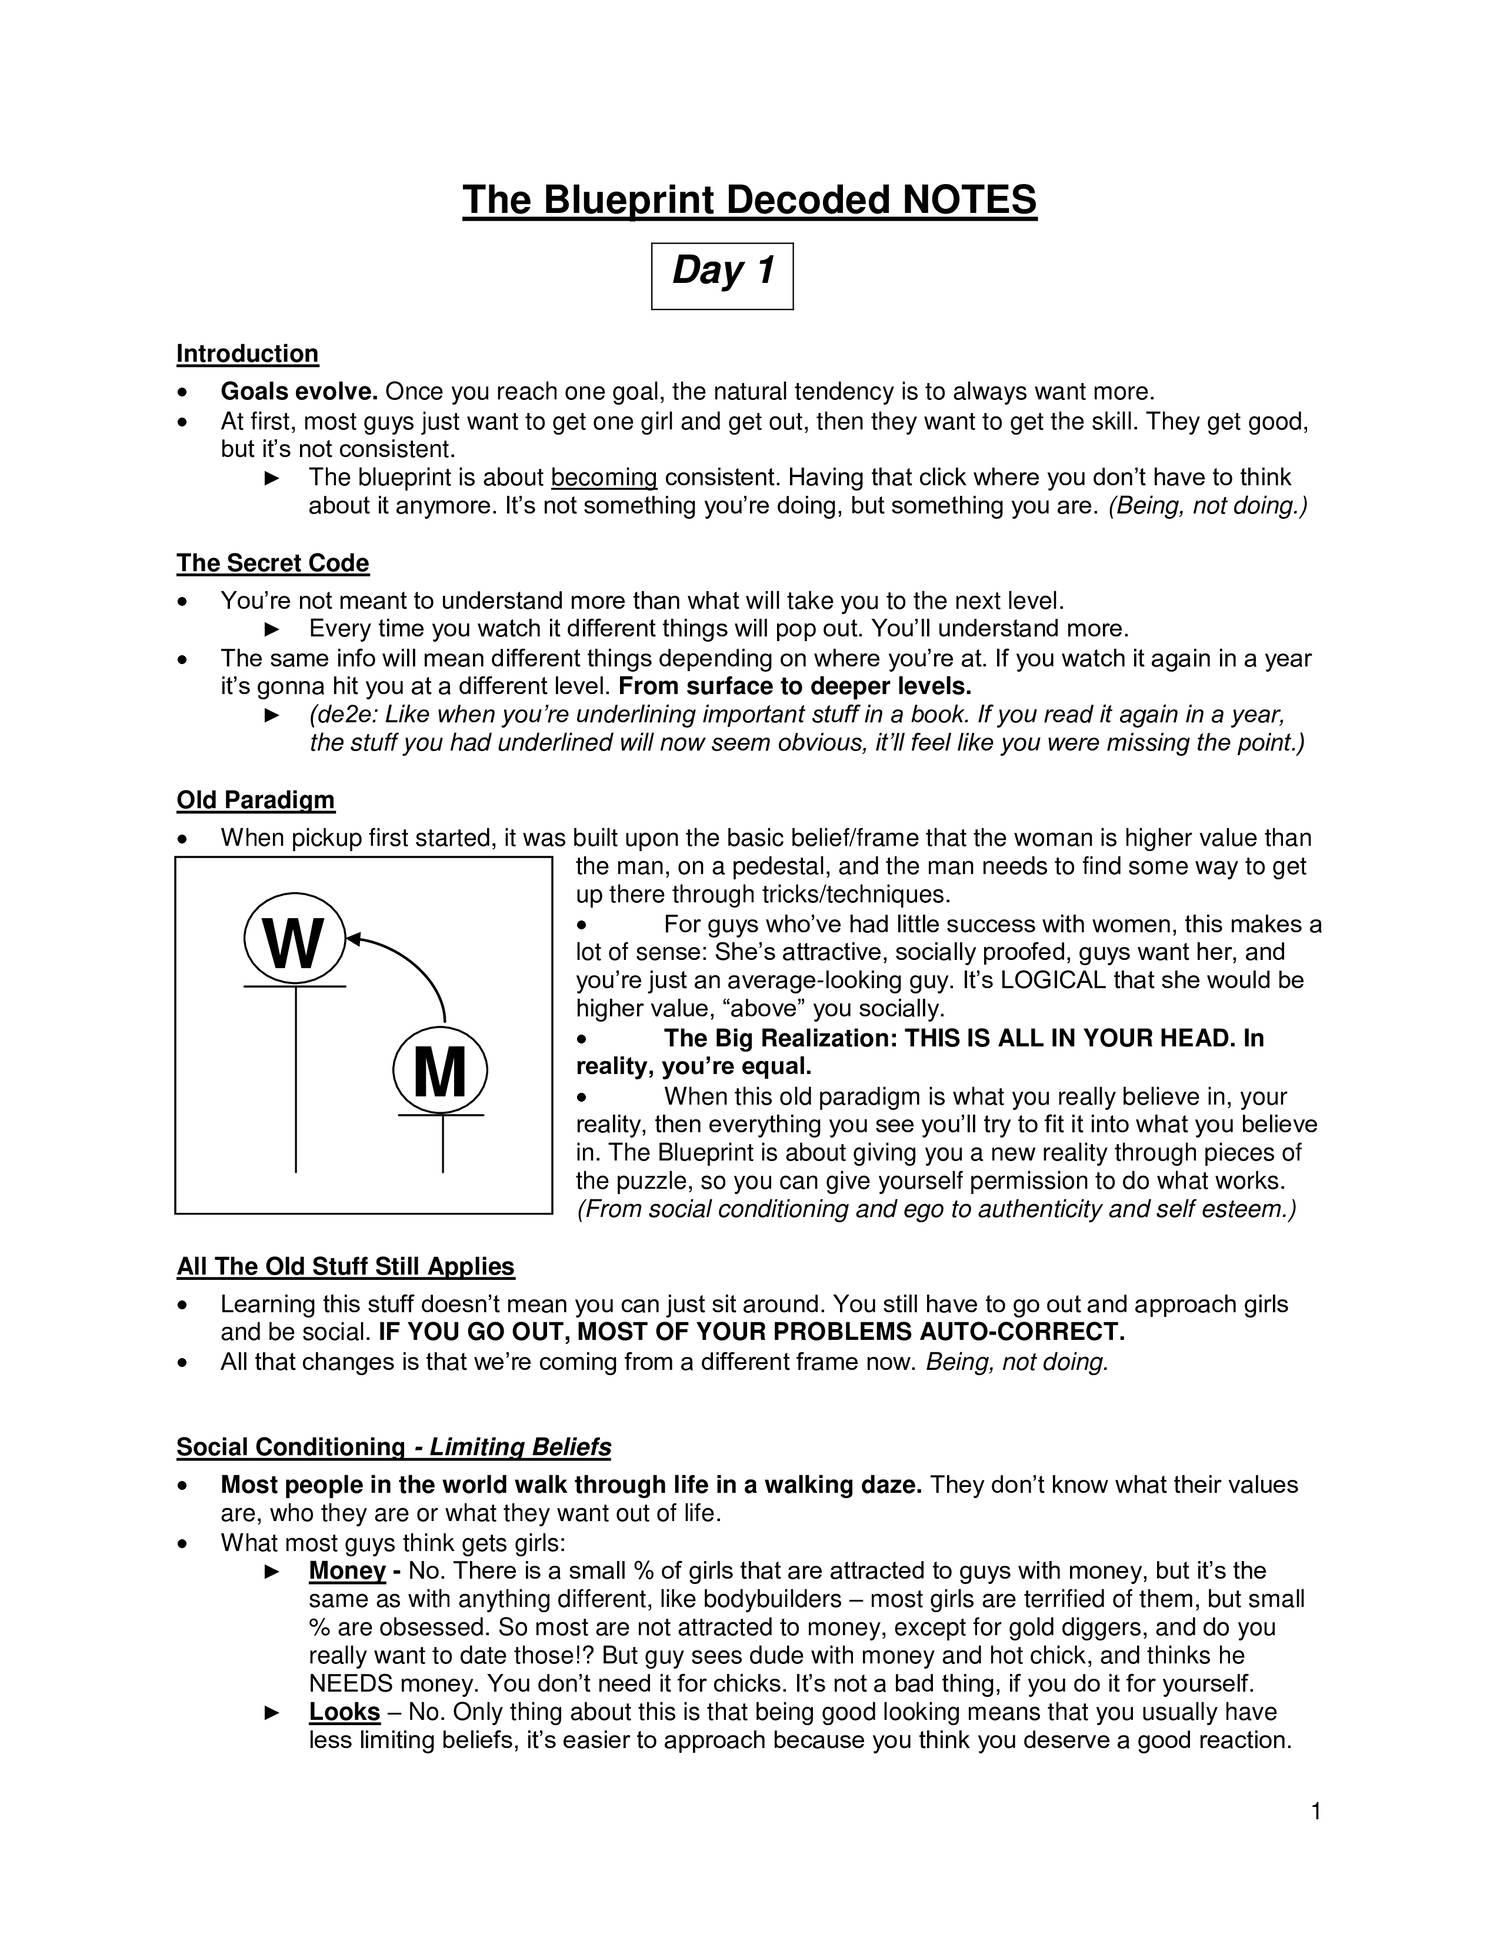 Blueprint decoded notes de2epdf docdroid malvernweather Image collections